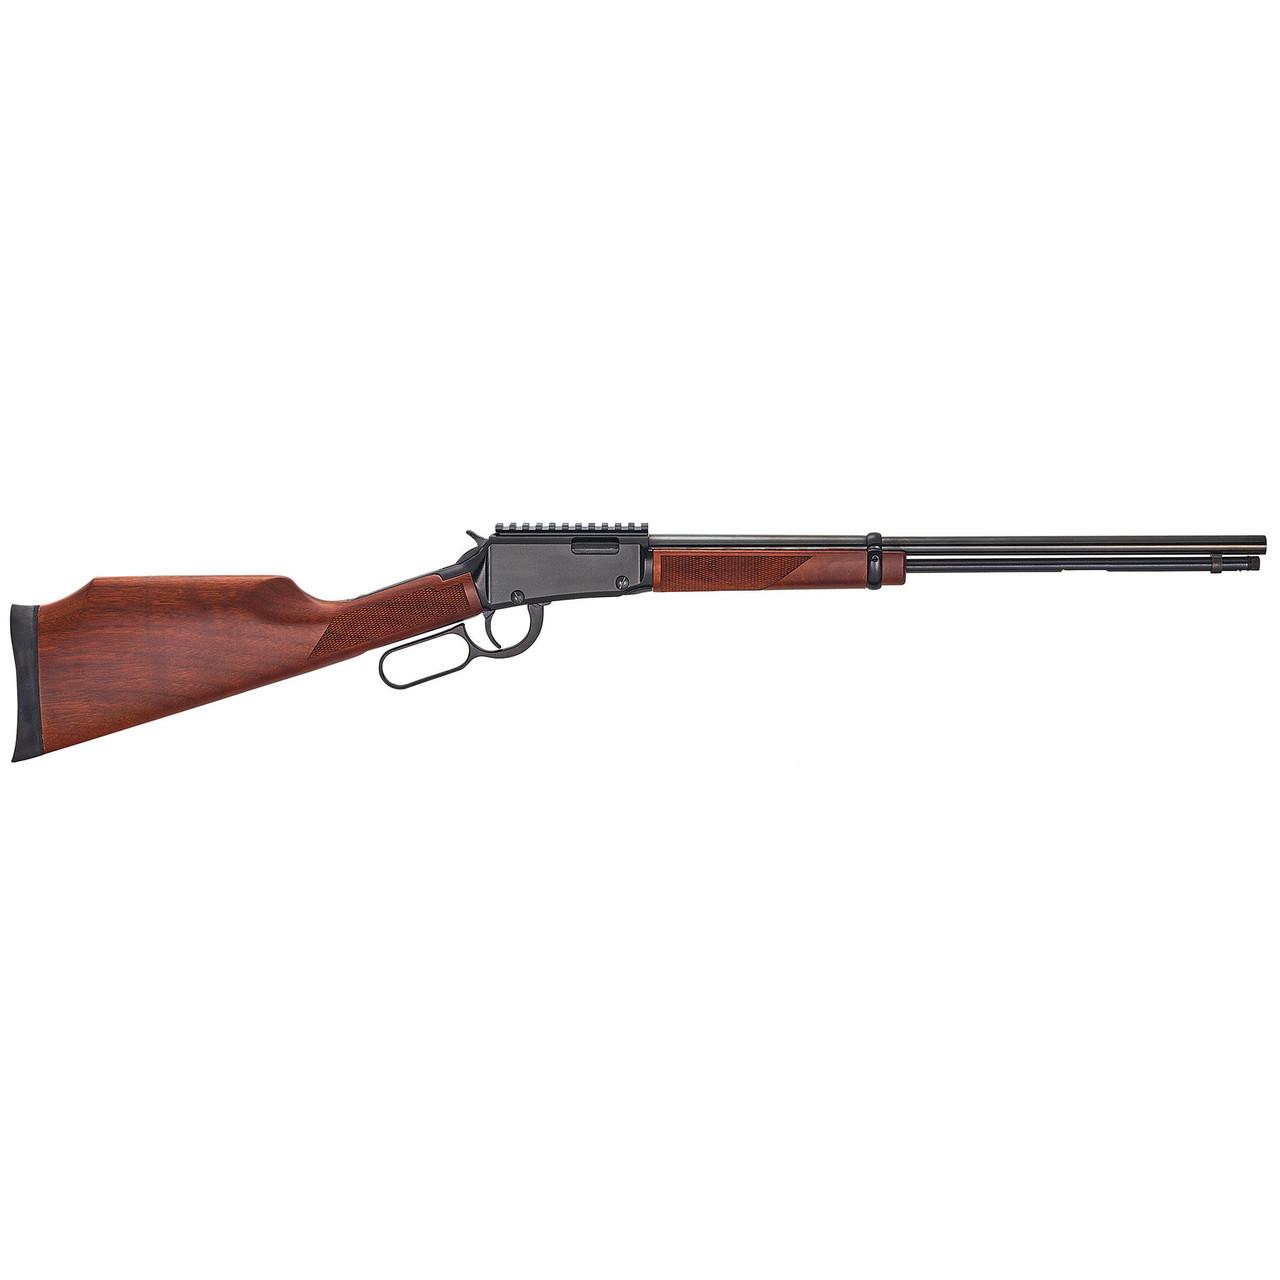 Henry Lever Action Magnum Express CALIFORNIA LEGAL - .22 WMR - Walnut